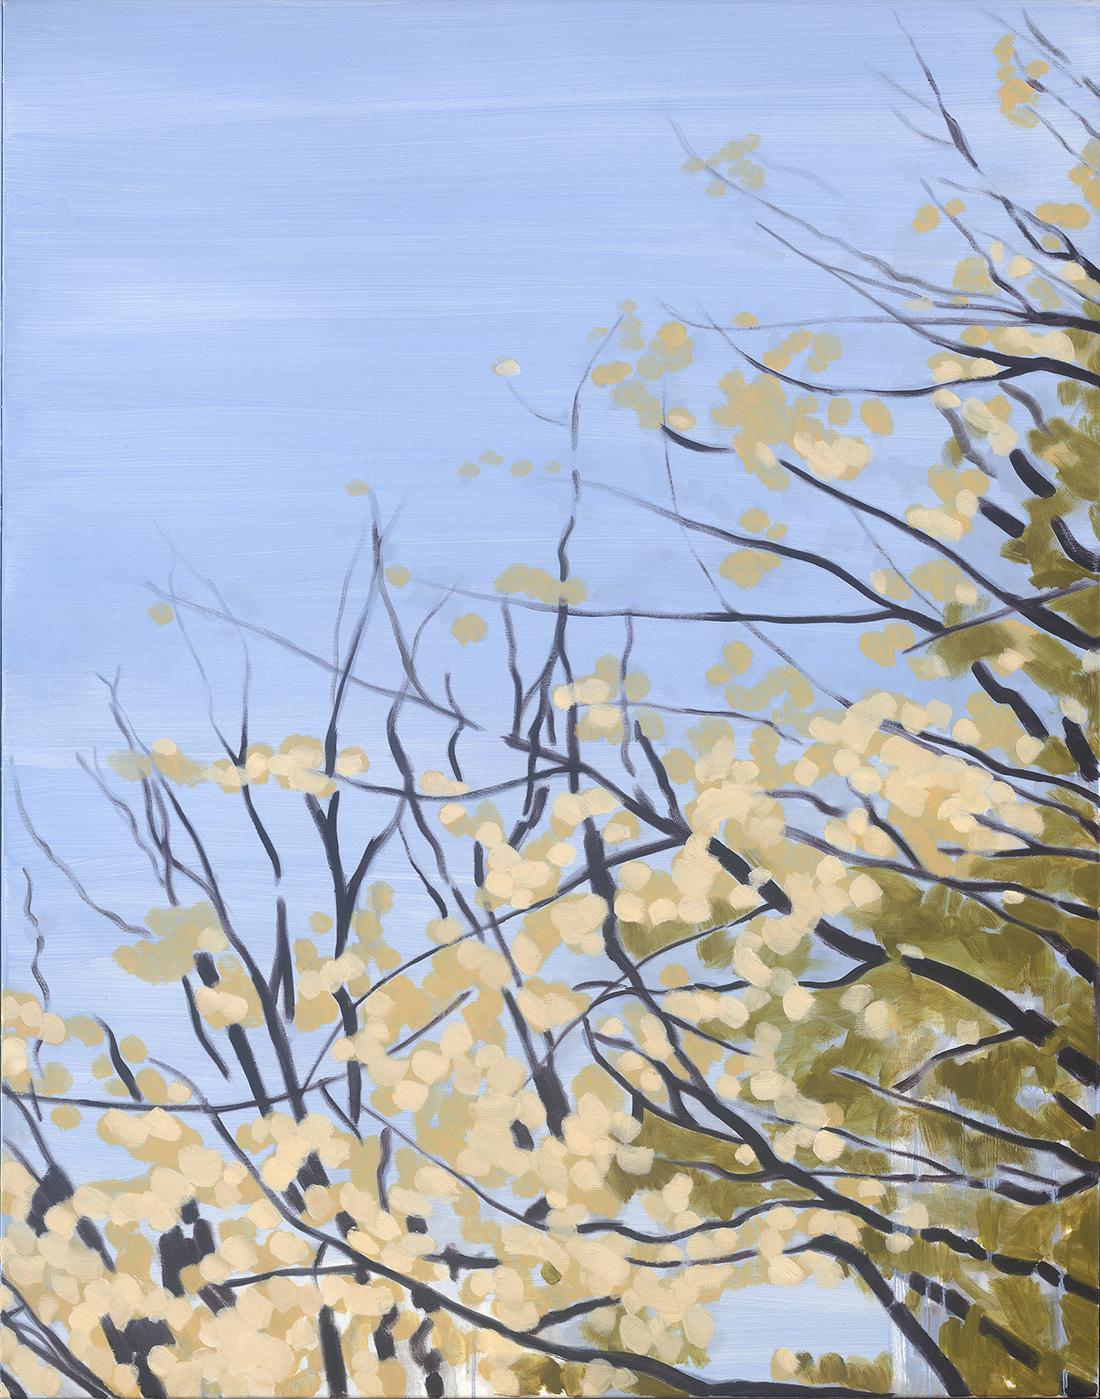 Blossom Sky, oil on linen, 107 x 83.5 cm (sold) (Finalist Ravenswood Womens Art Prize 2017)